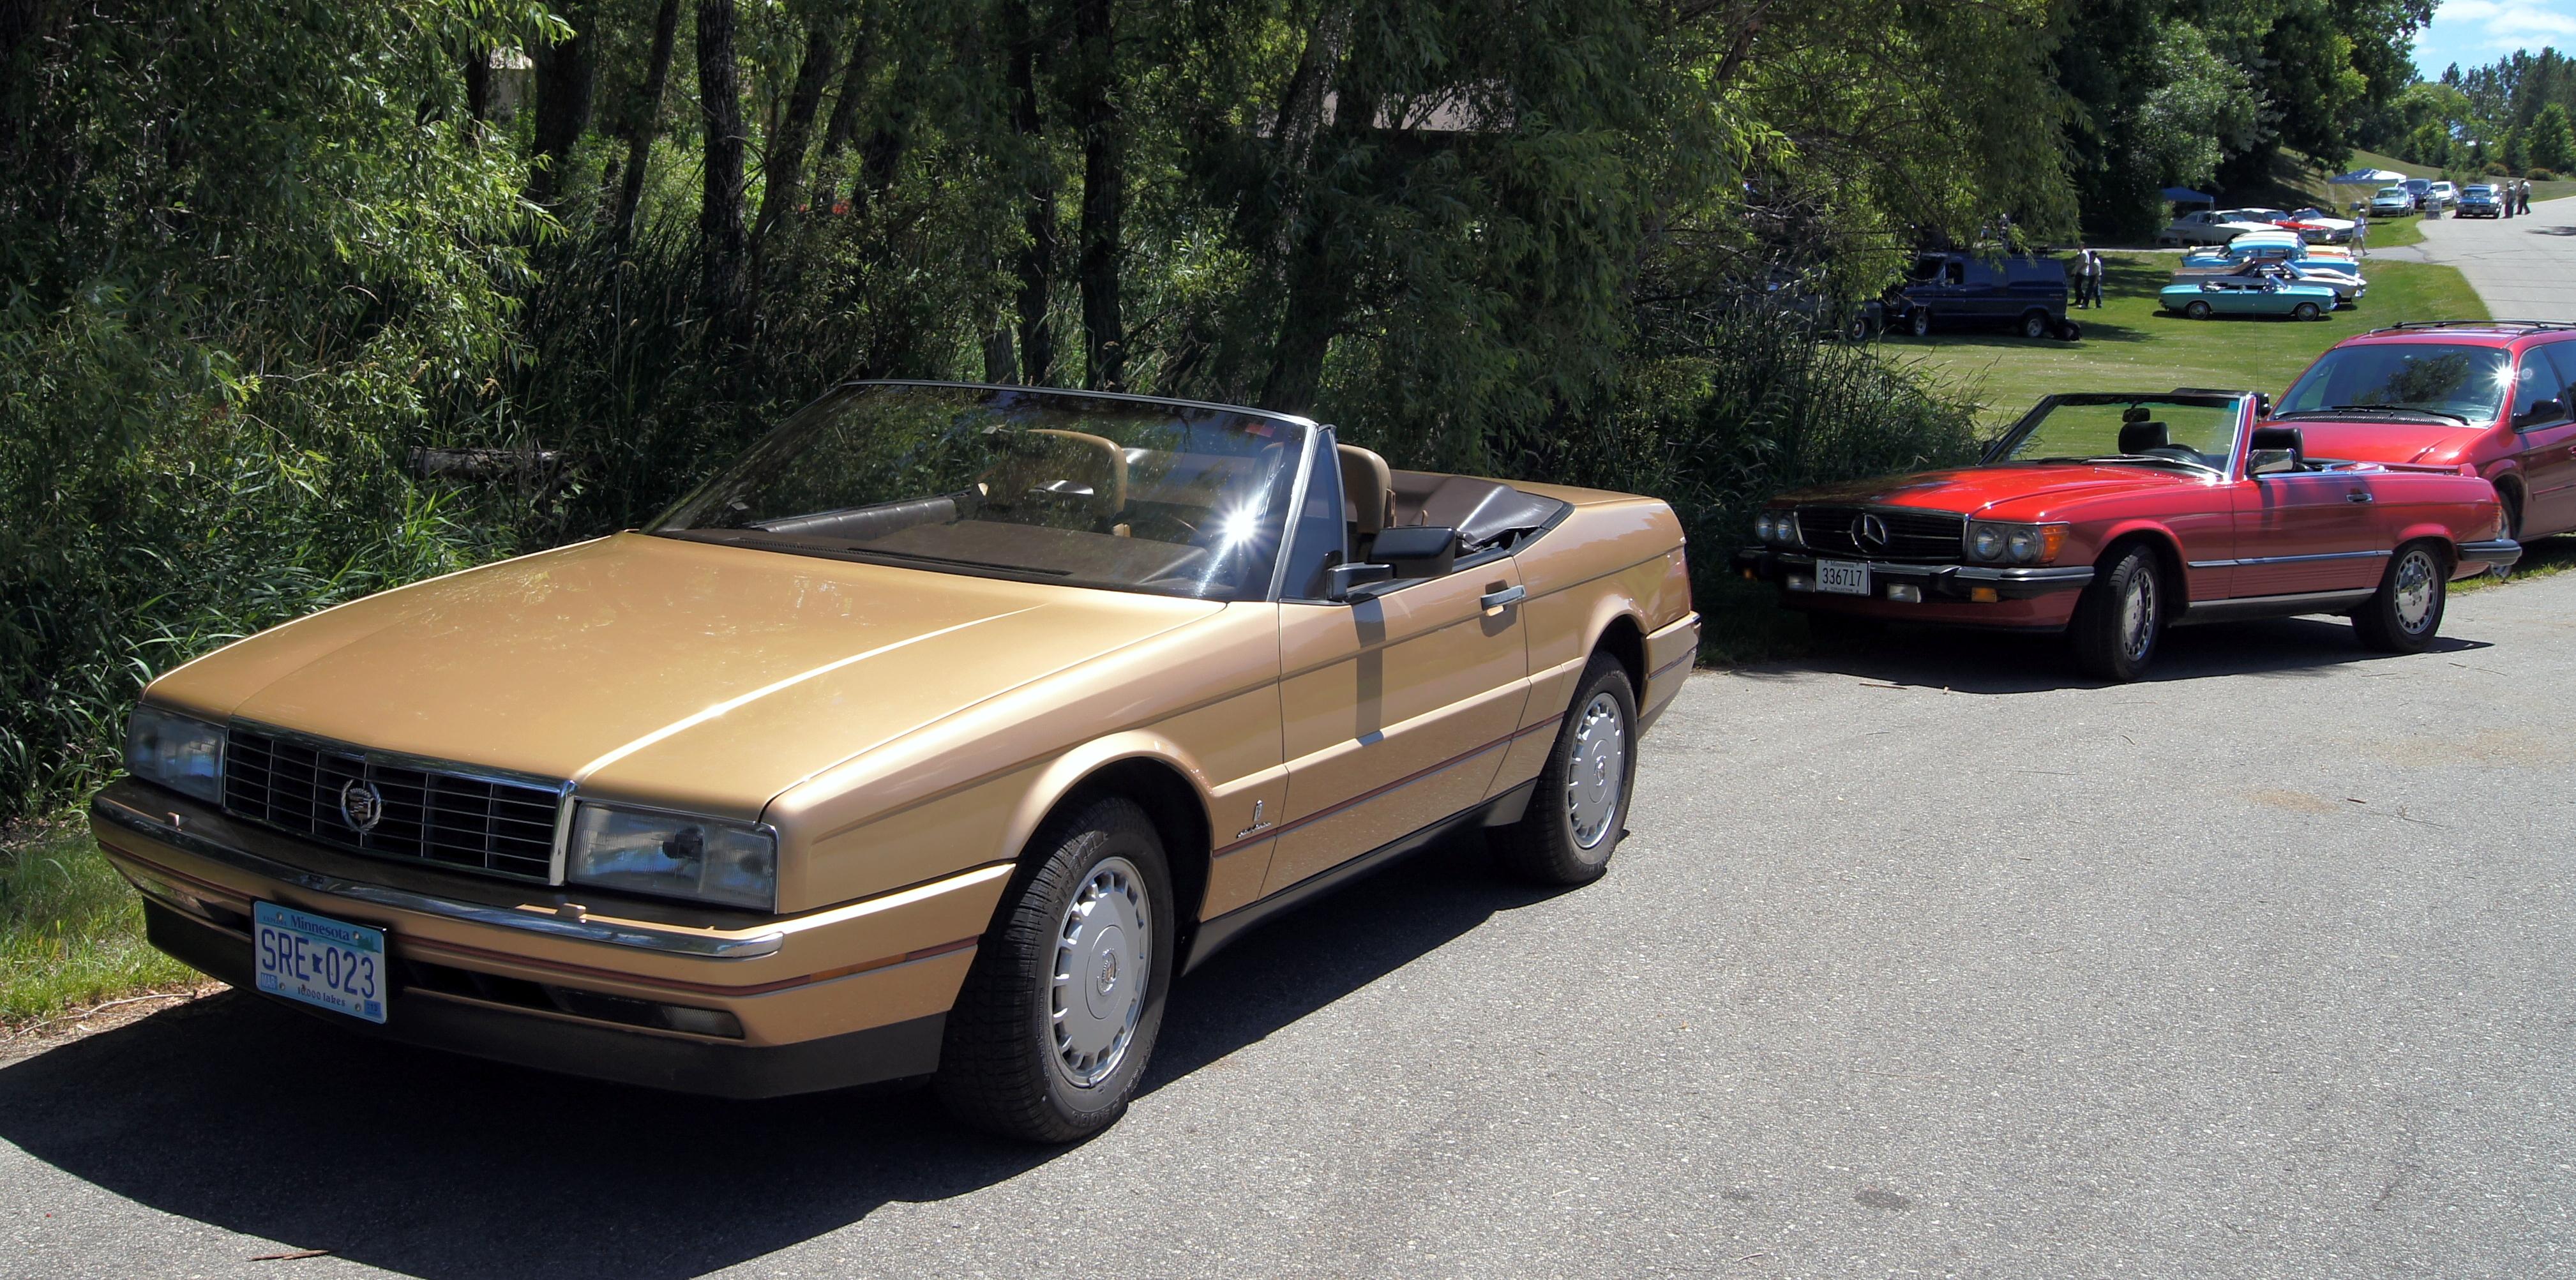 File:88 Mercedes 560 SL & 87 Cadillac Allante (9456393616).jpg ...